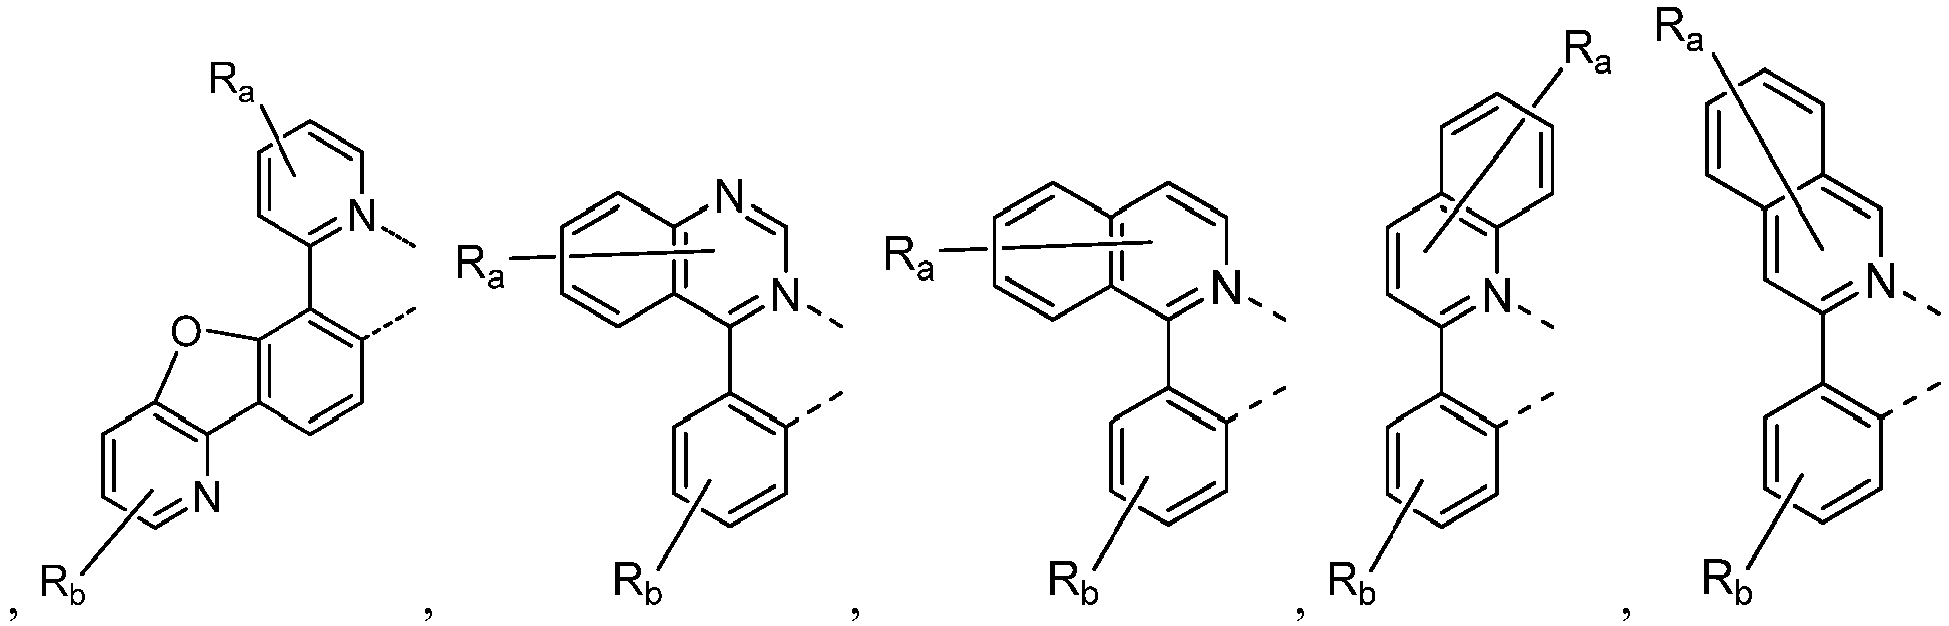 Figure imgb0788